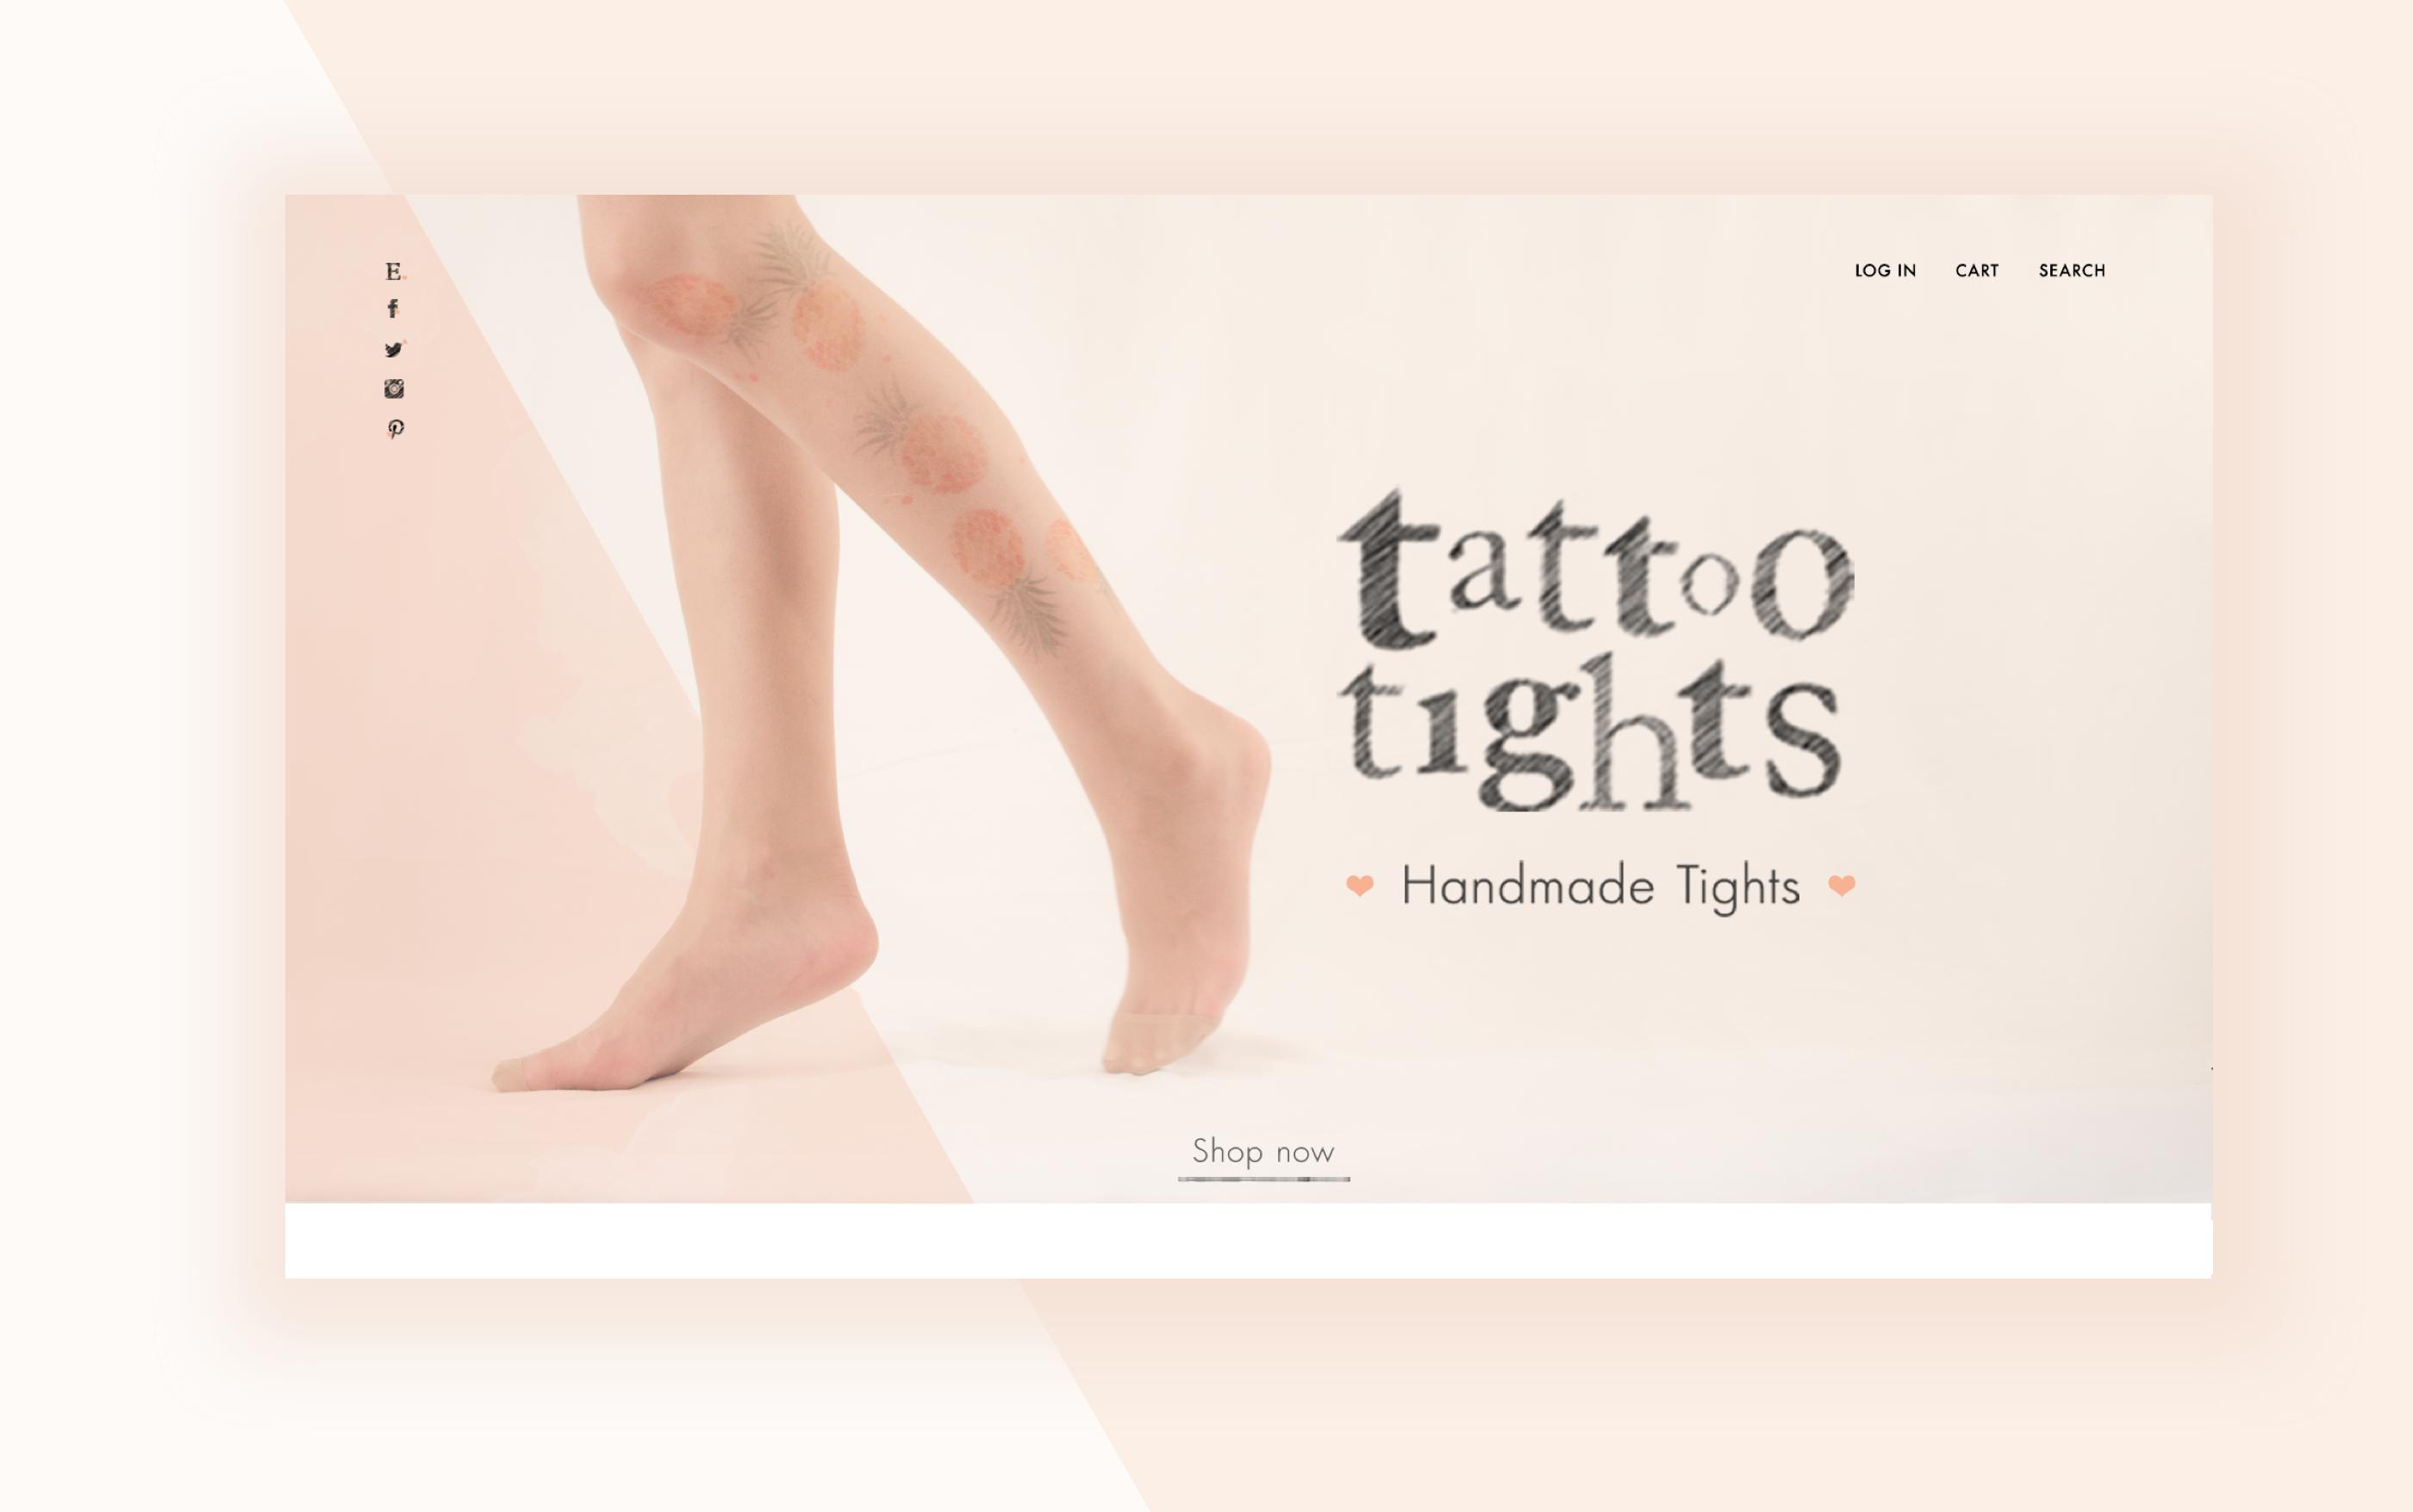 Tattootights